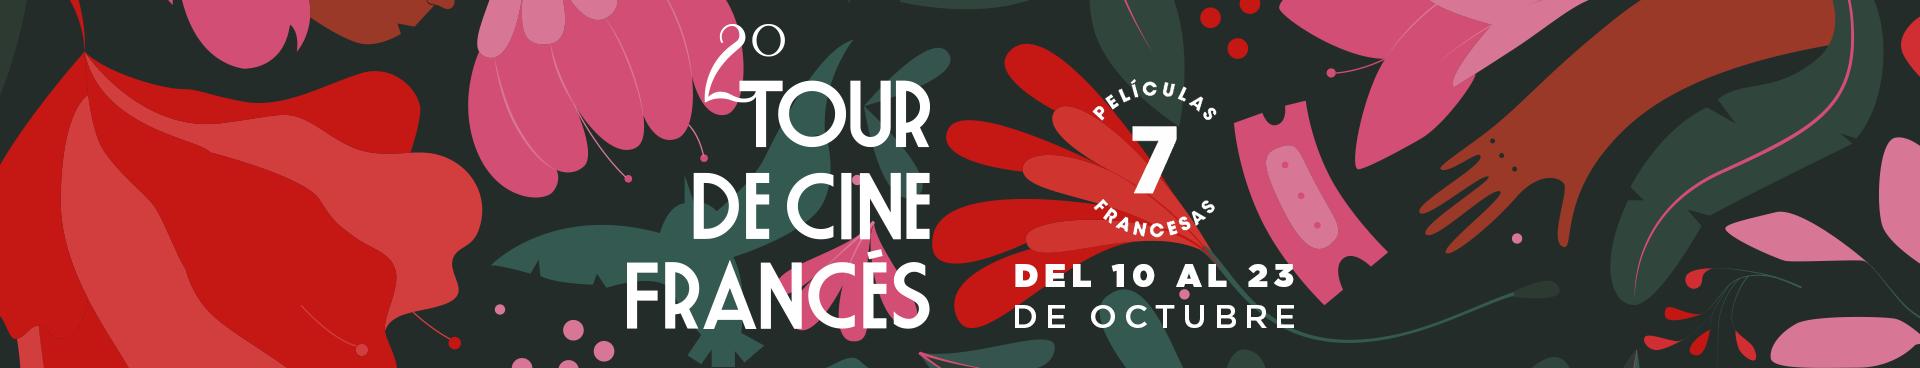 2DO TOUR DE CINE FRANCÉS (2019), DESDE EL 10 AL 23 DE OCTUBRE